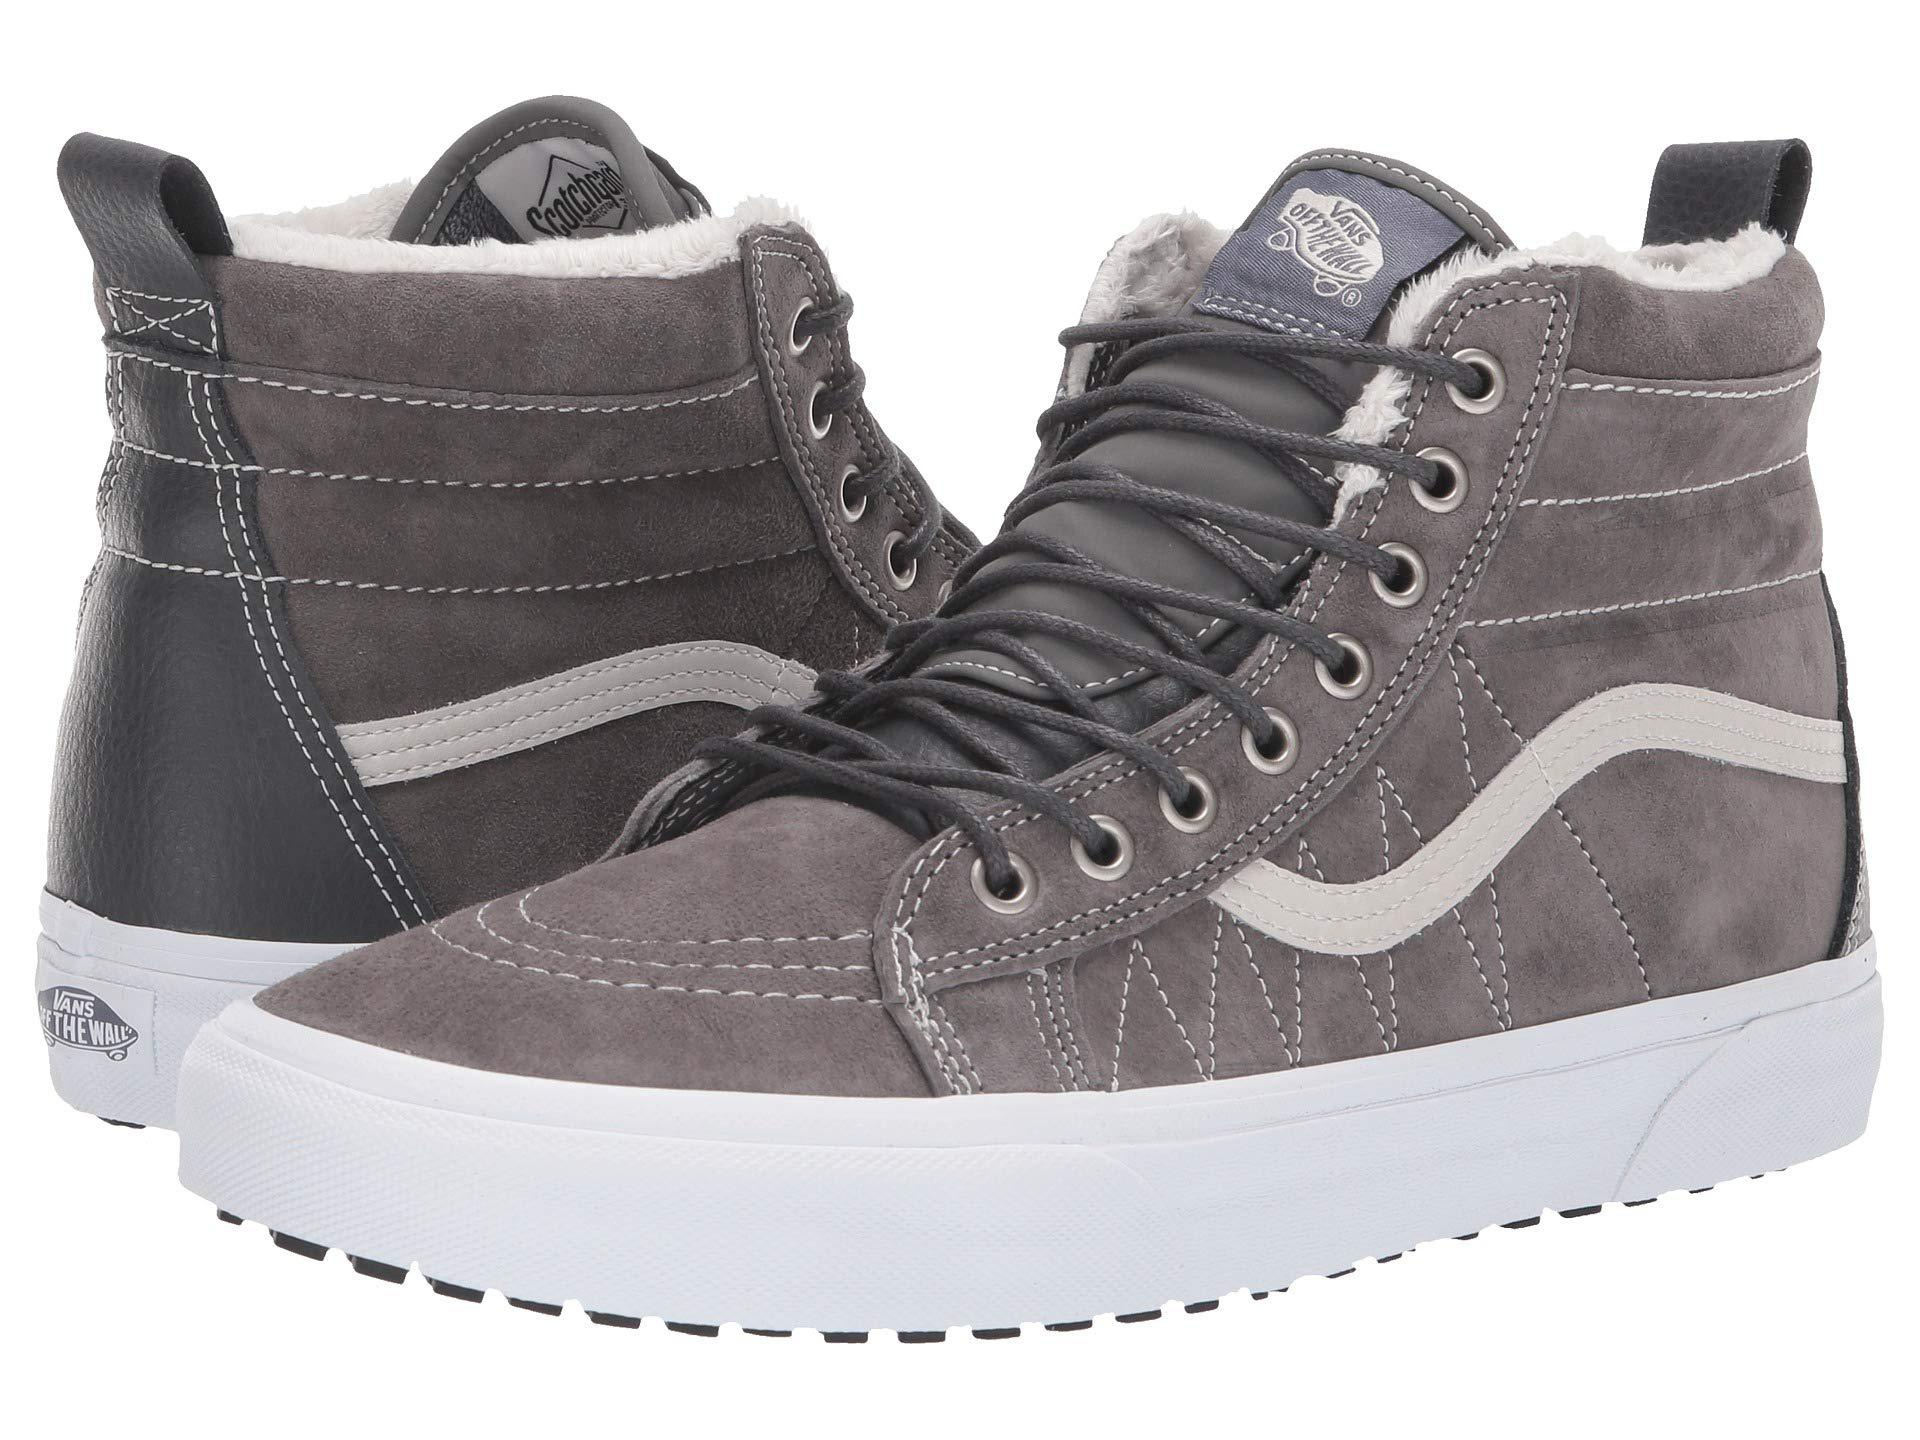 a56717259a Lyst - Vans Sk8-hi Mte ((mte) Cornstalk marshmallow) Skate Shoes in ...